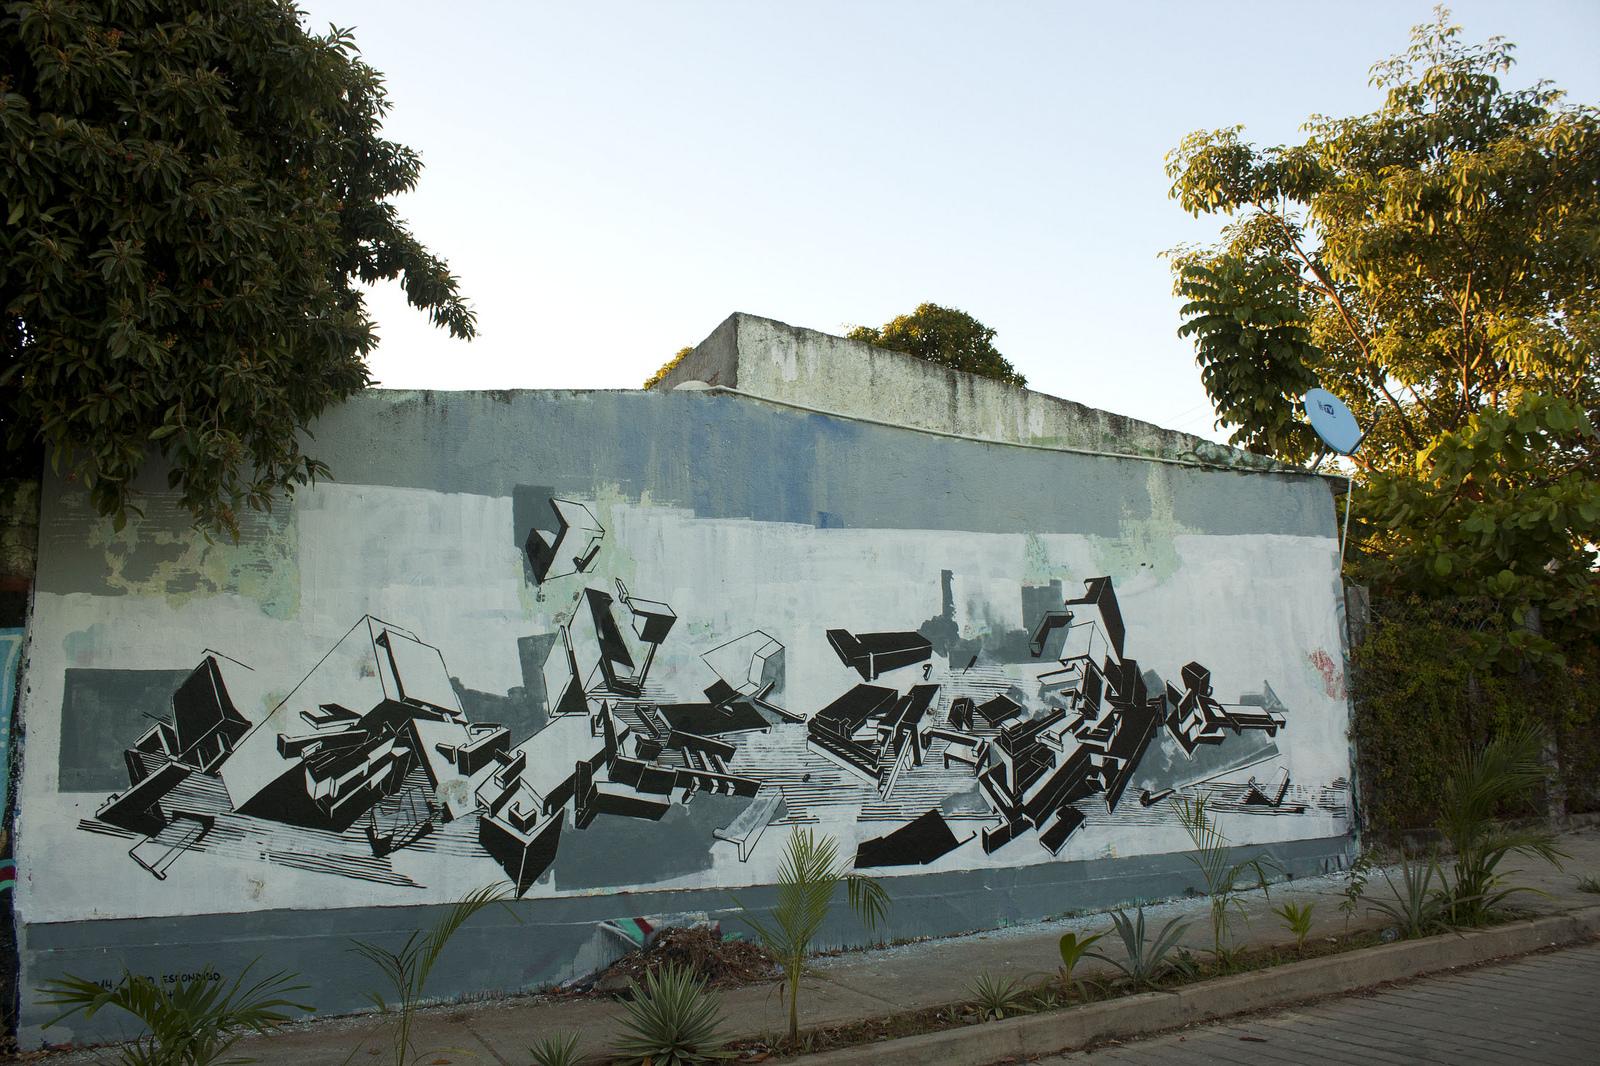 kidghe-desgaste-new-mural-in-puerto-escondido-oaxaca-01